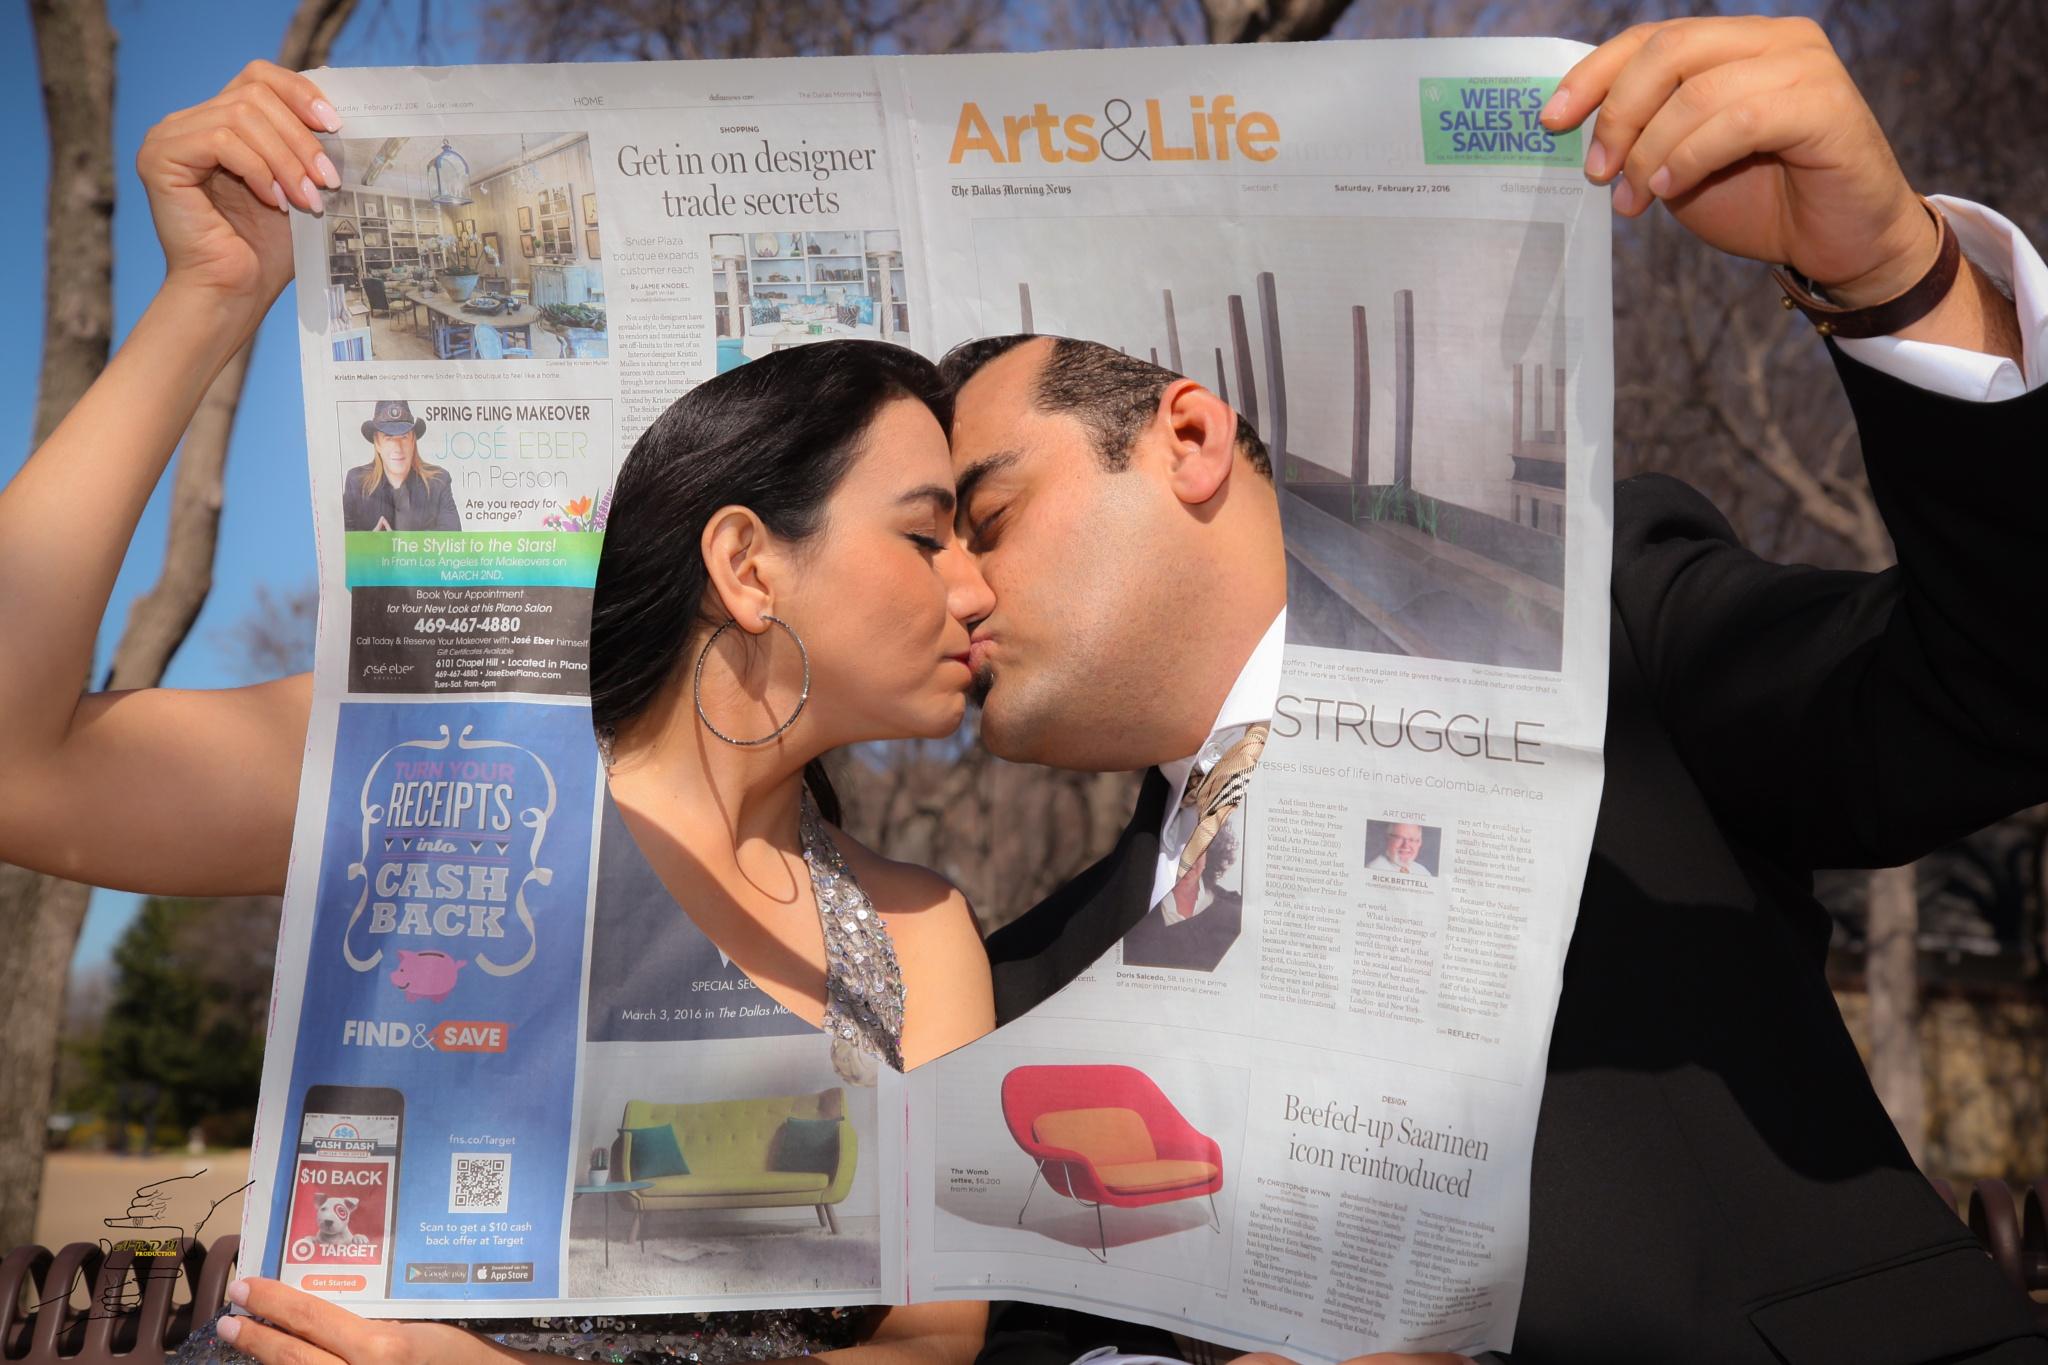 Art & Life by ArdyB